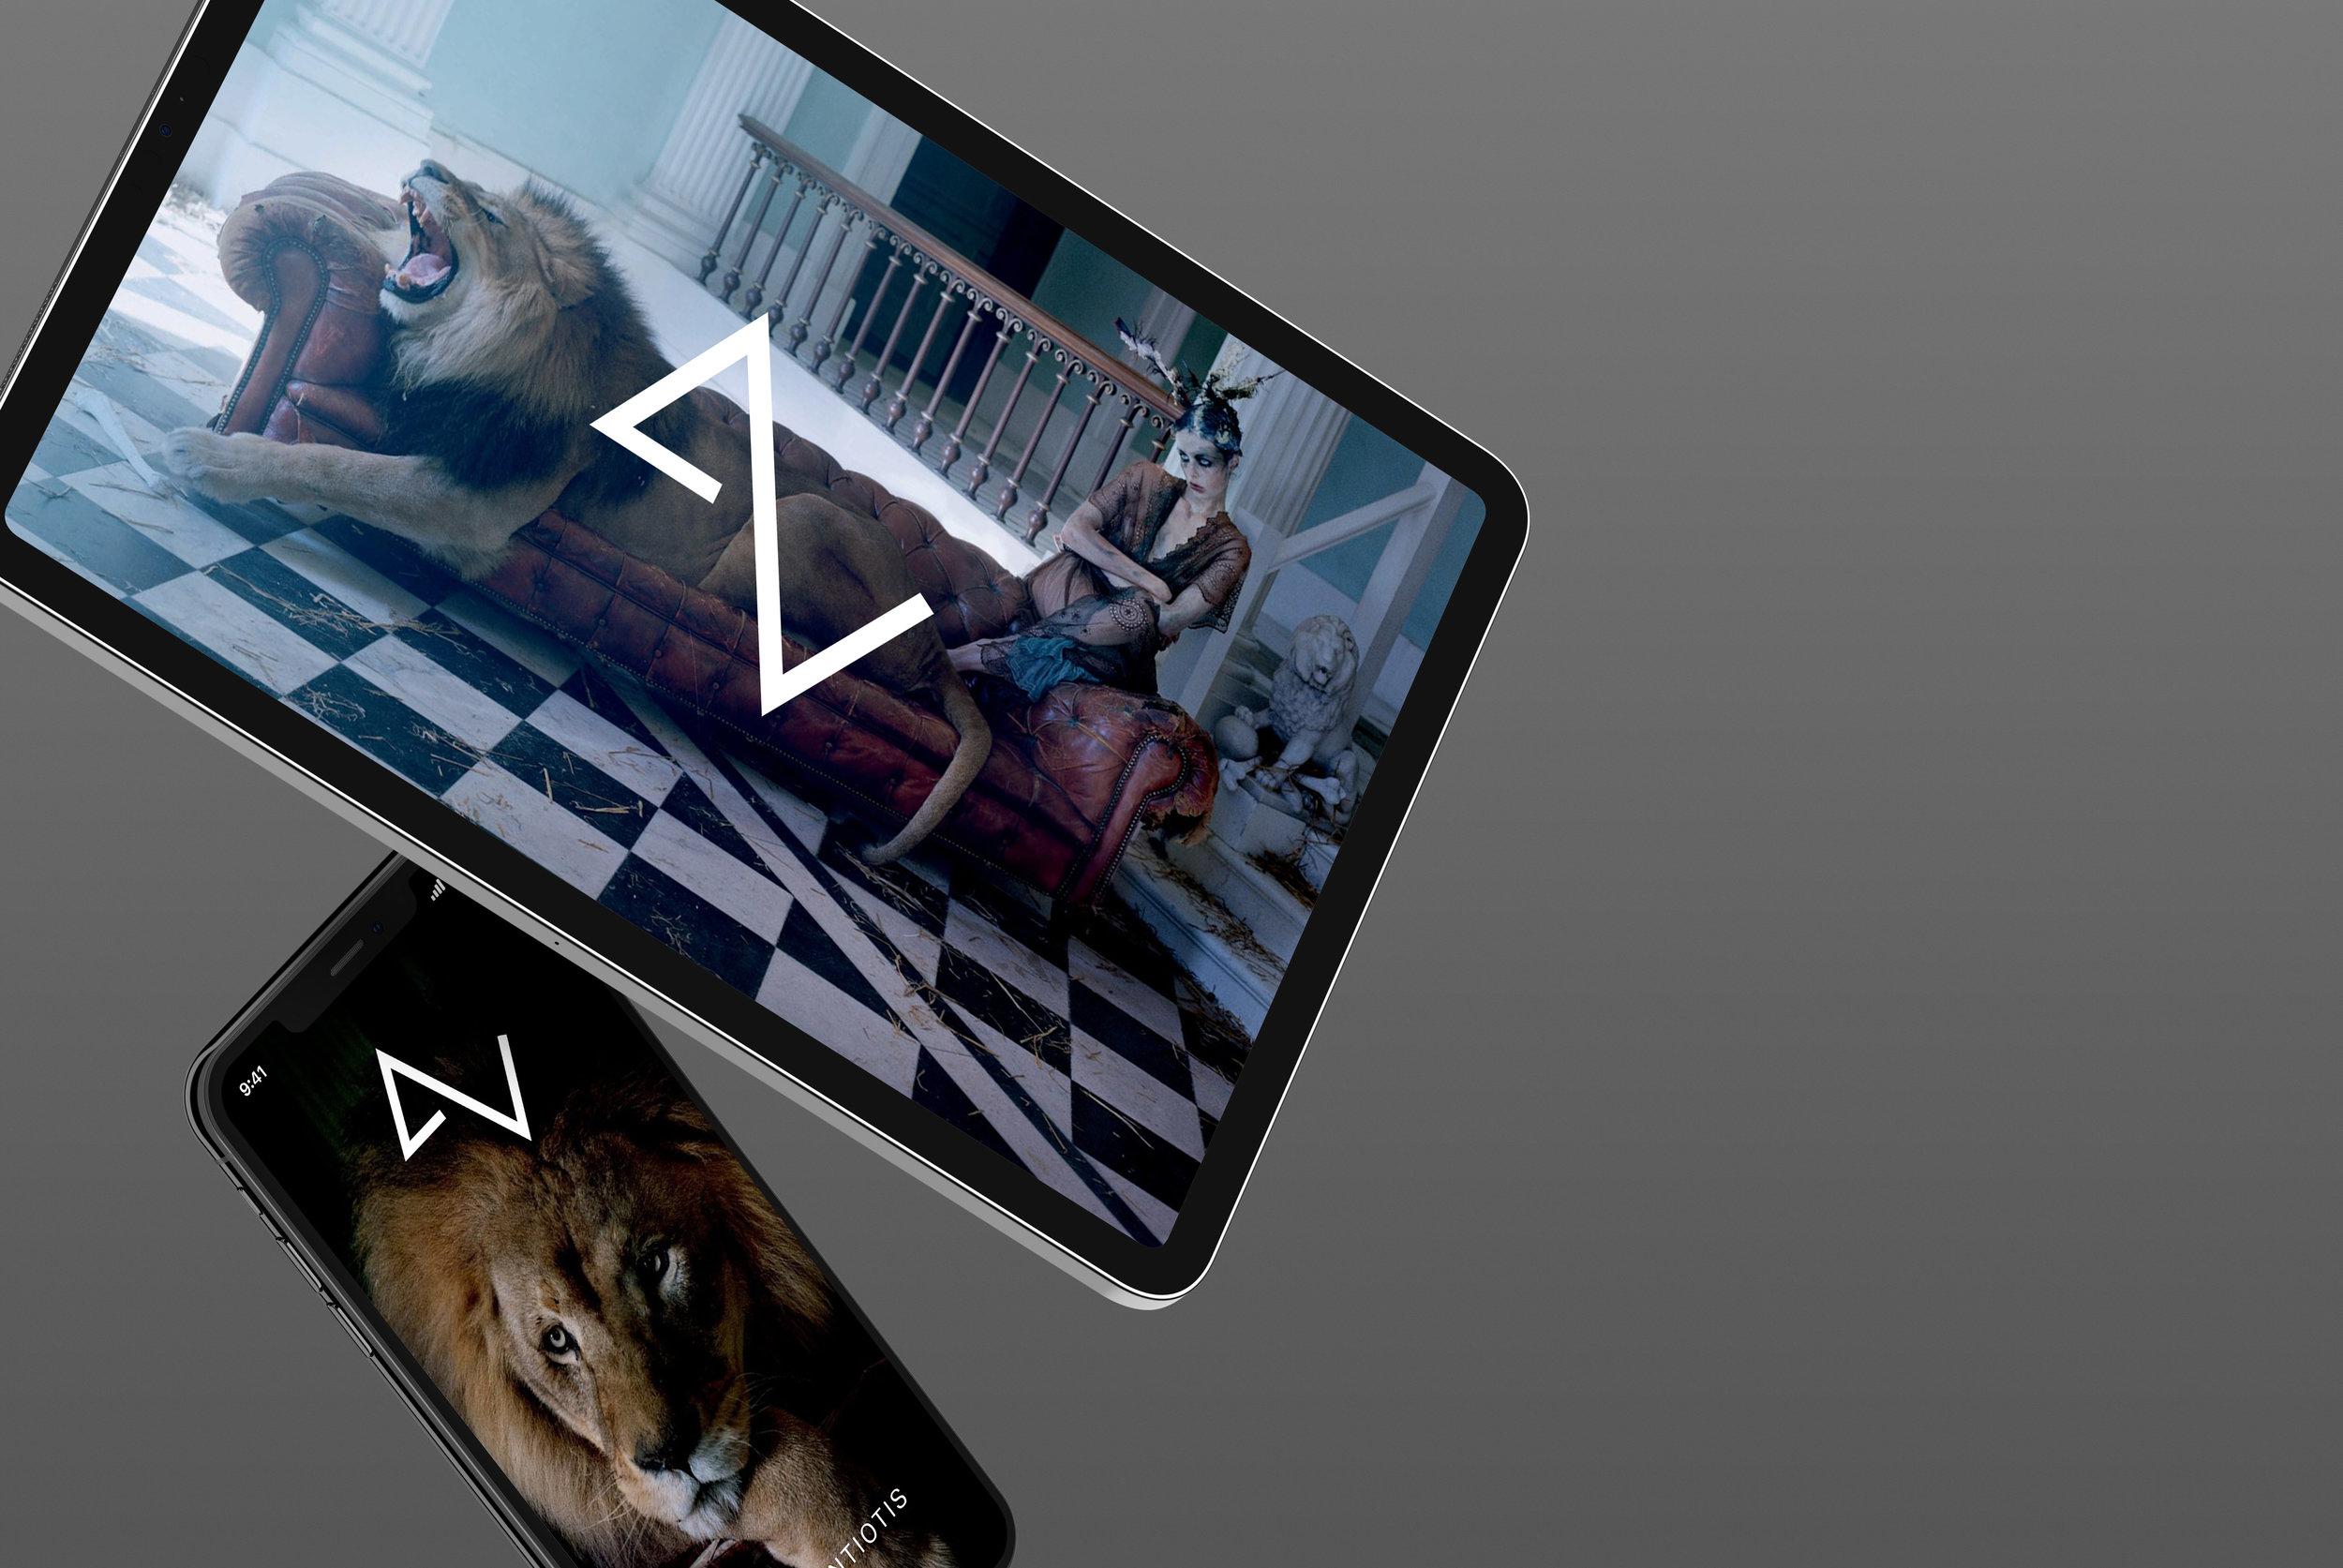 AZ_Devices_Crop01.jpg